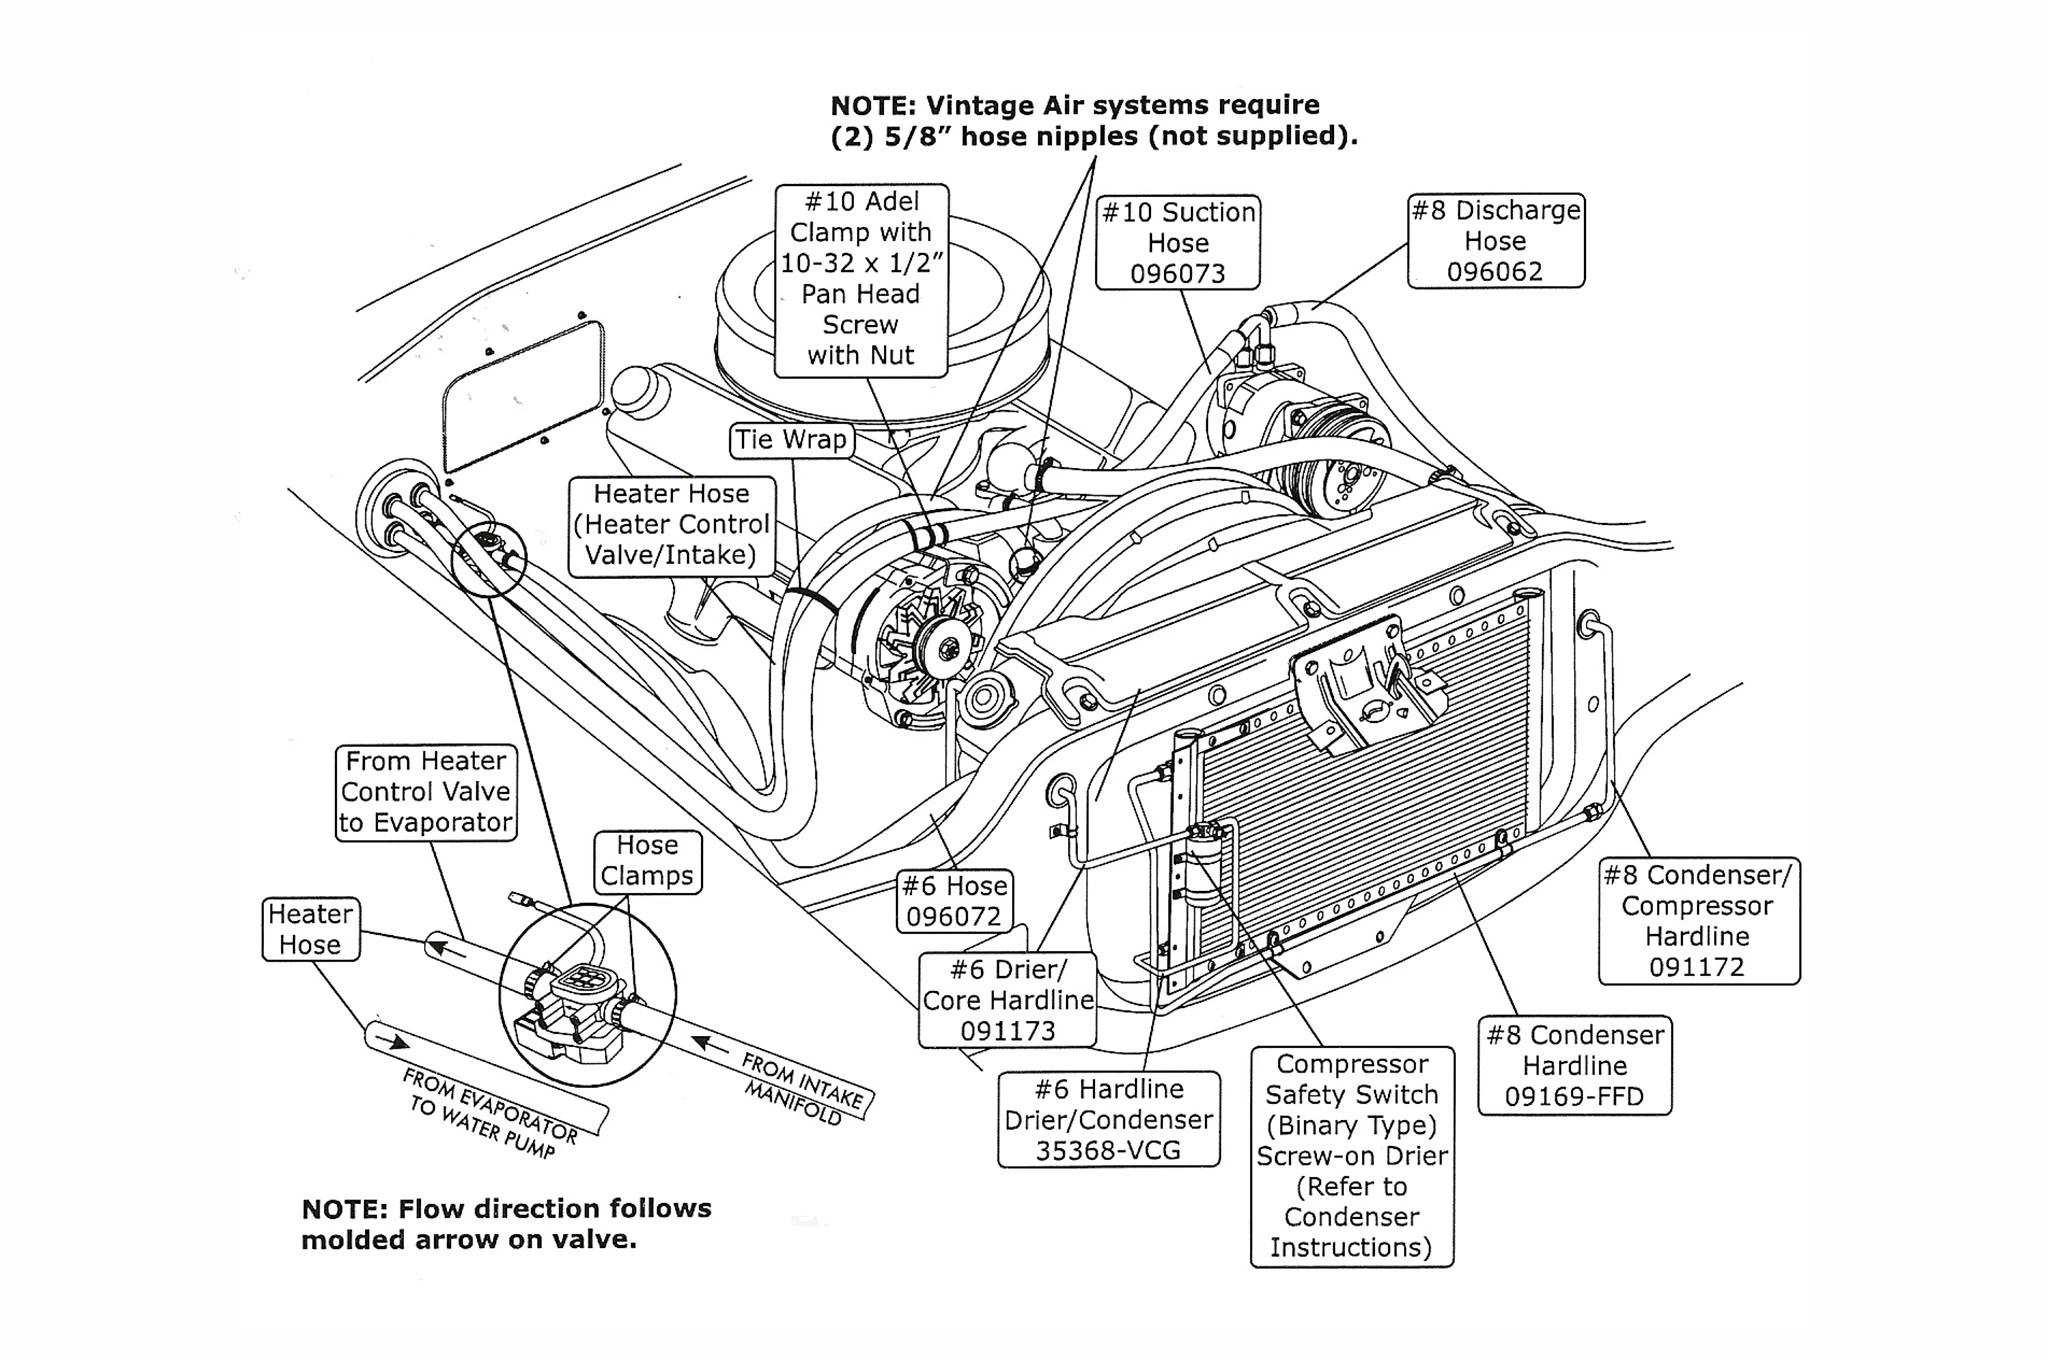 chevelle alternator wiring diagram on 1967 chevelle alternator wiring diagram 66 chevelle [ 2048 x 1360 Pixel ]